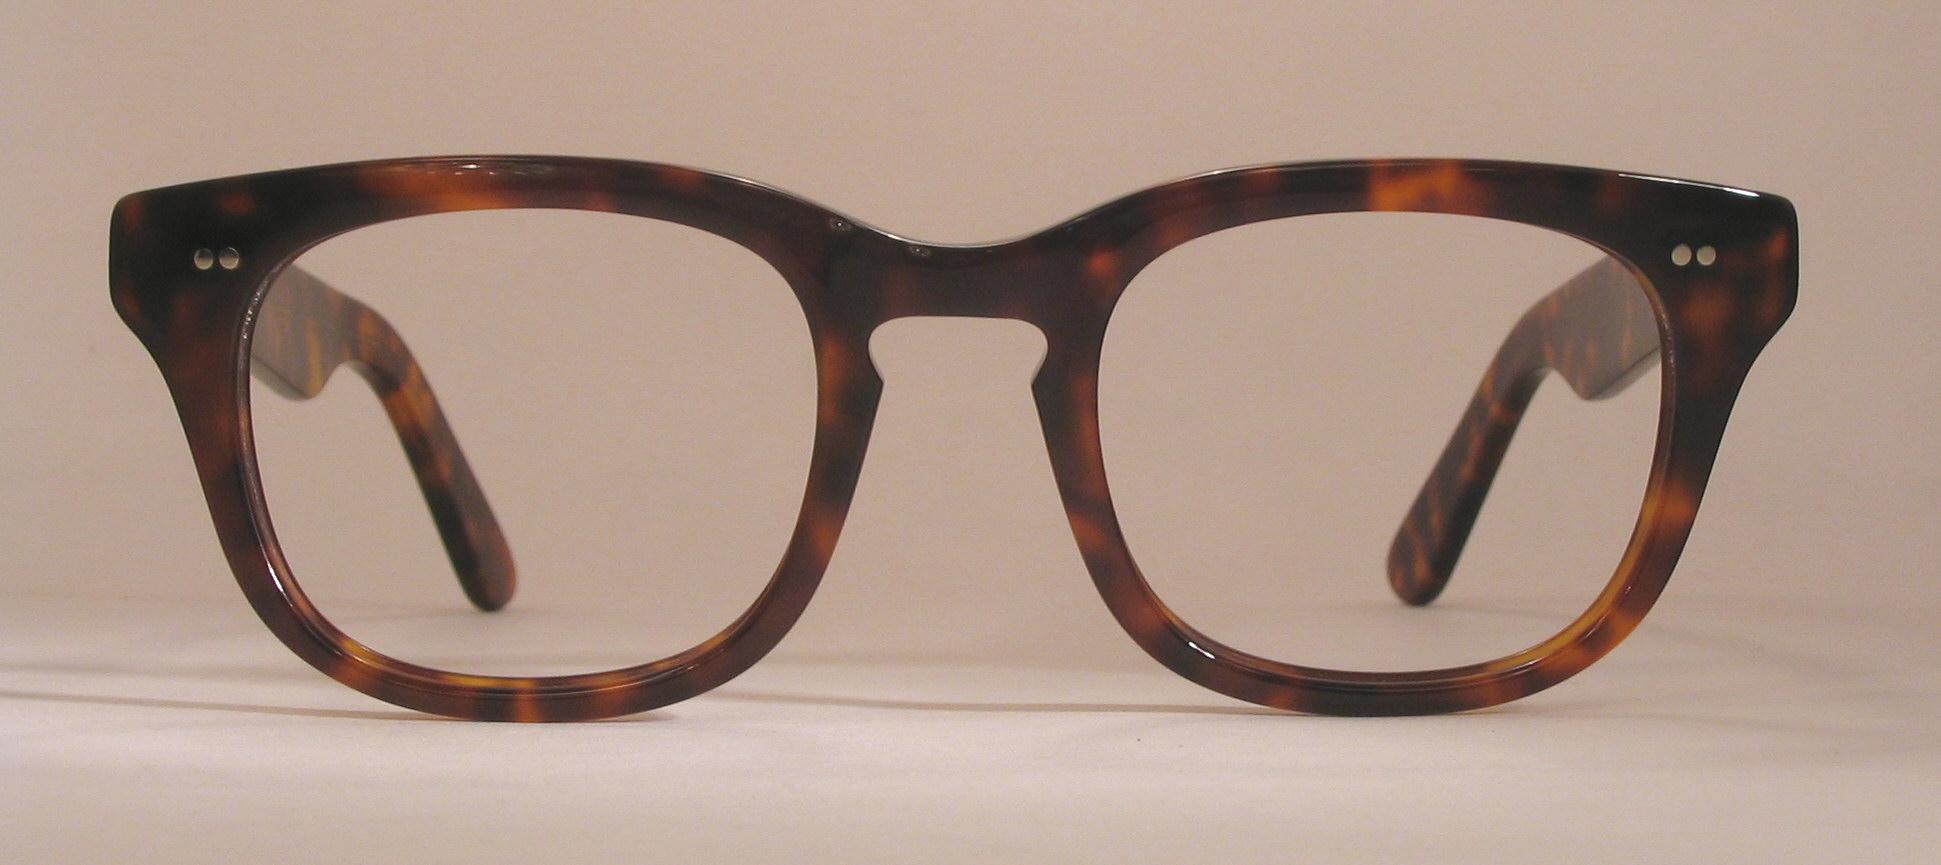 554fcfdaa63b Optometrist Attic - TORTOISE SHURON SIDEWINDER EYEGLASSES